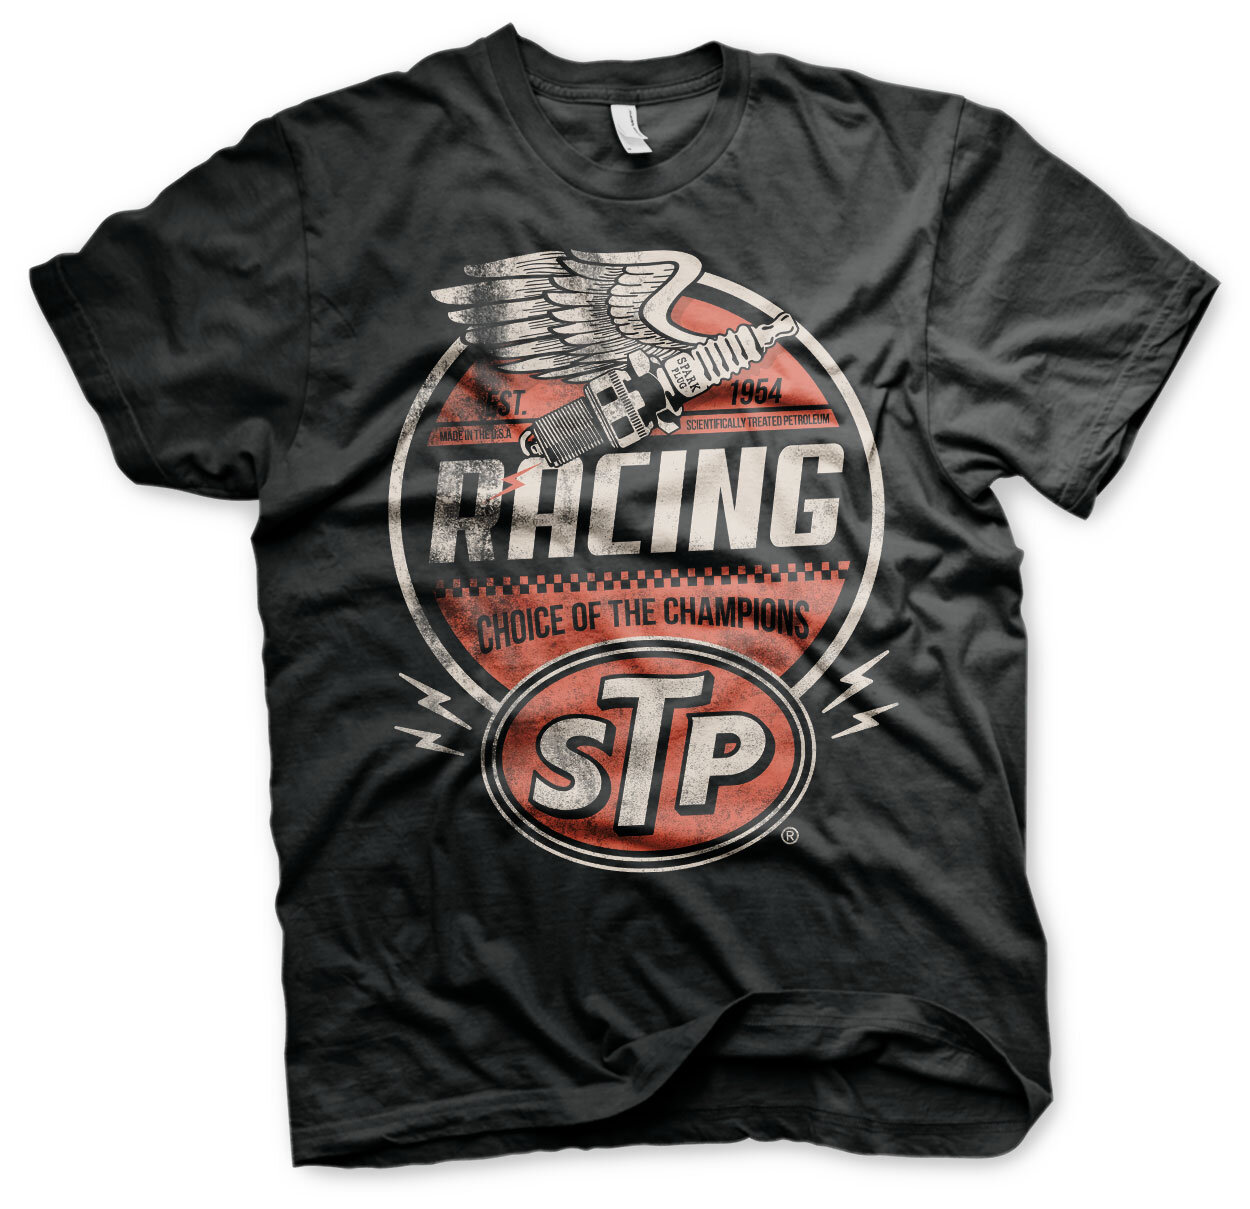 STP Vintage Racing T-Shirt